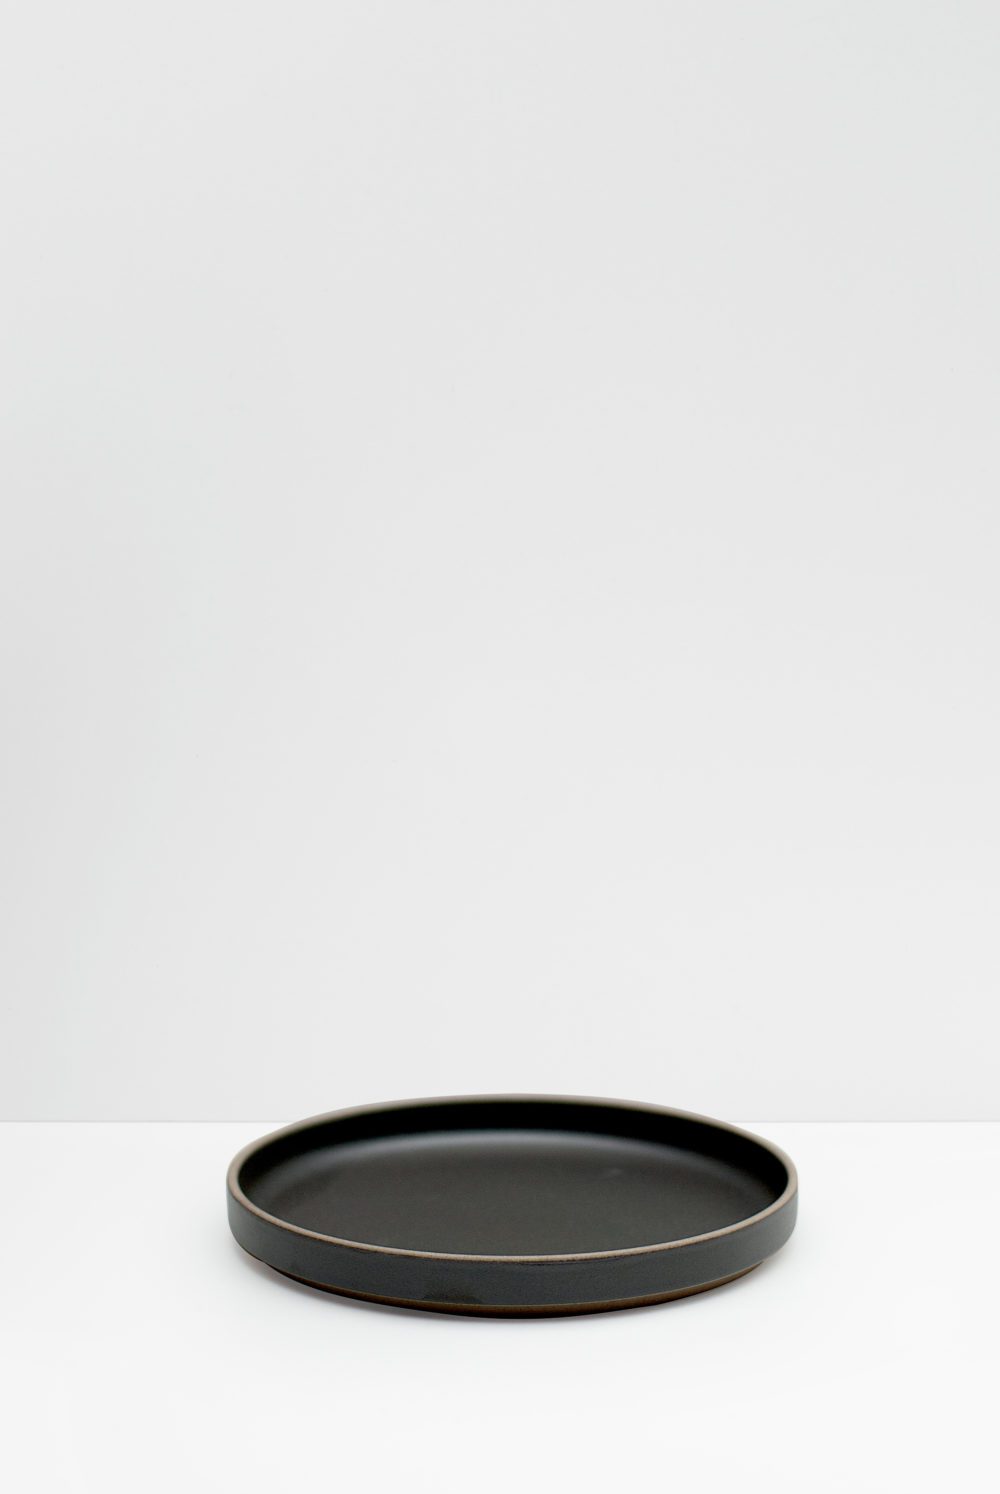 Hasami Porcelain appetizer plate